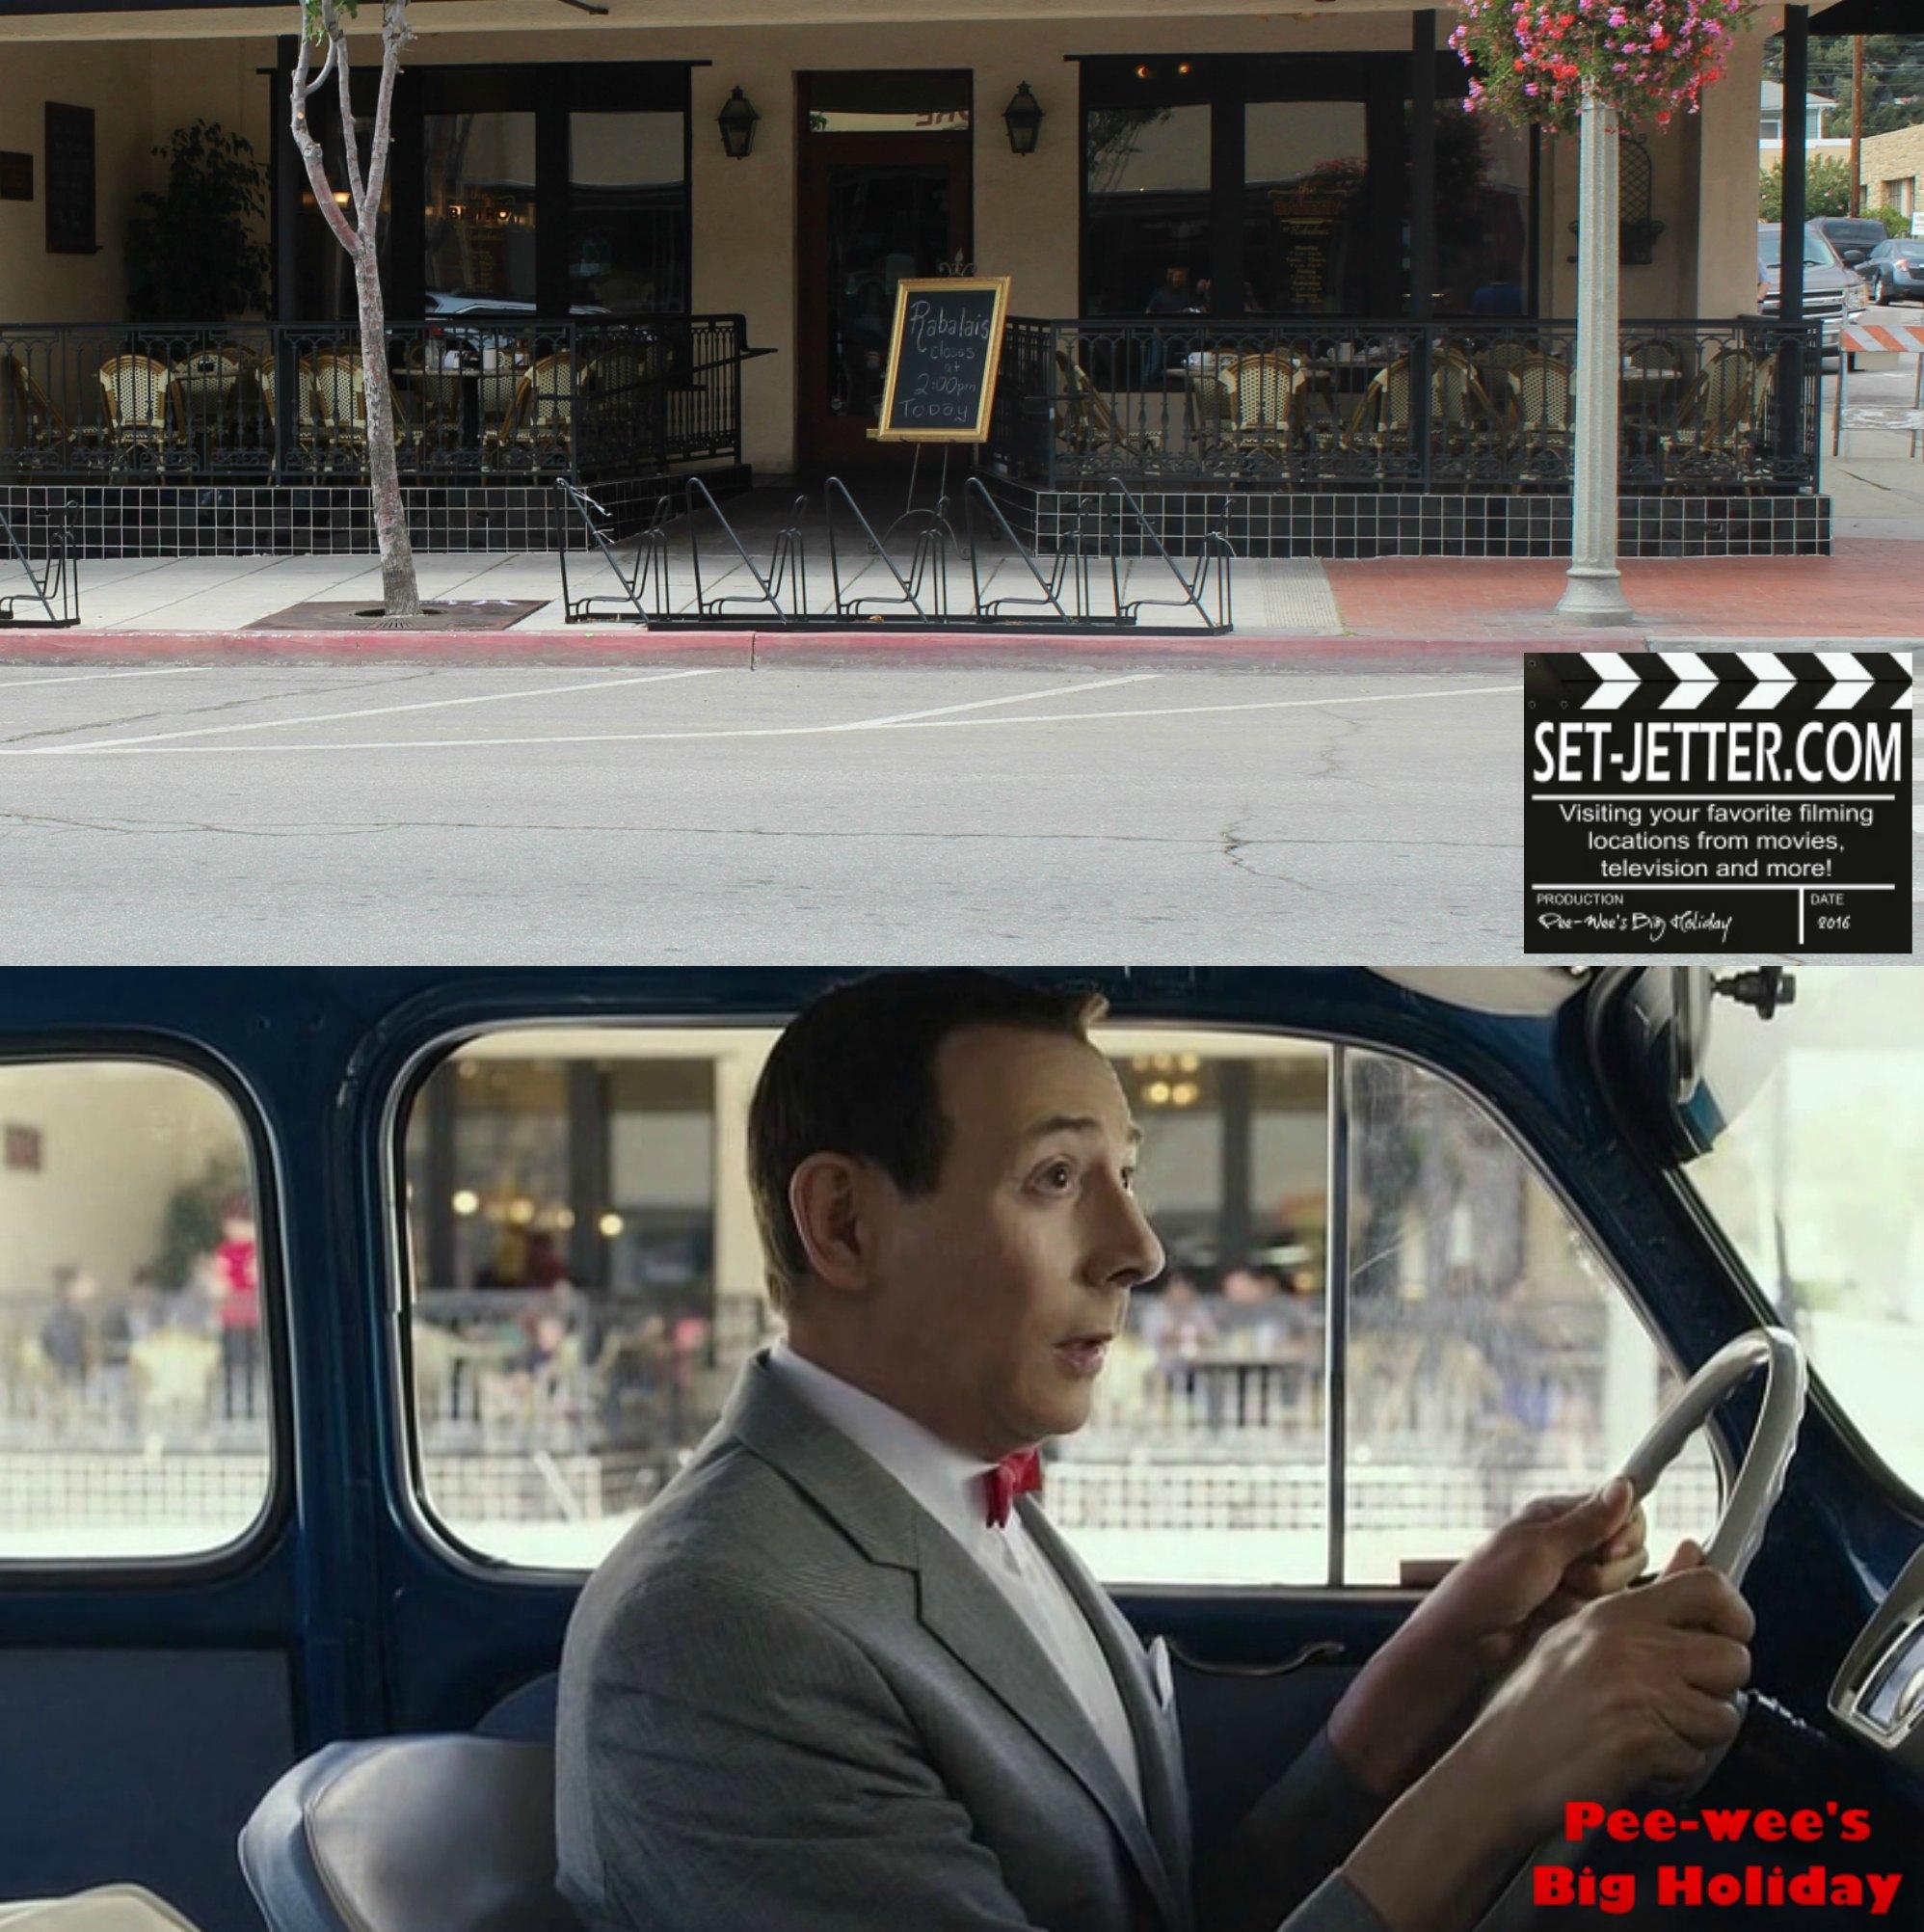 Pee Wee's Big Holiday comparison 342.jpg